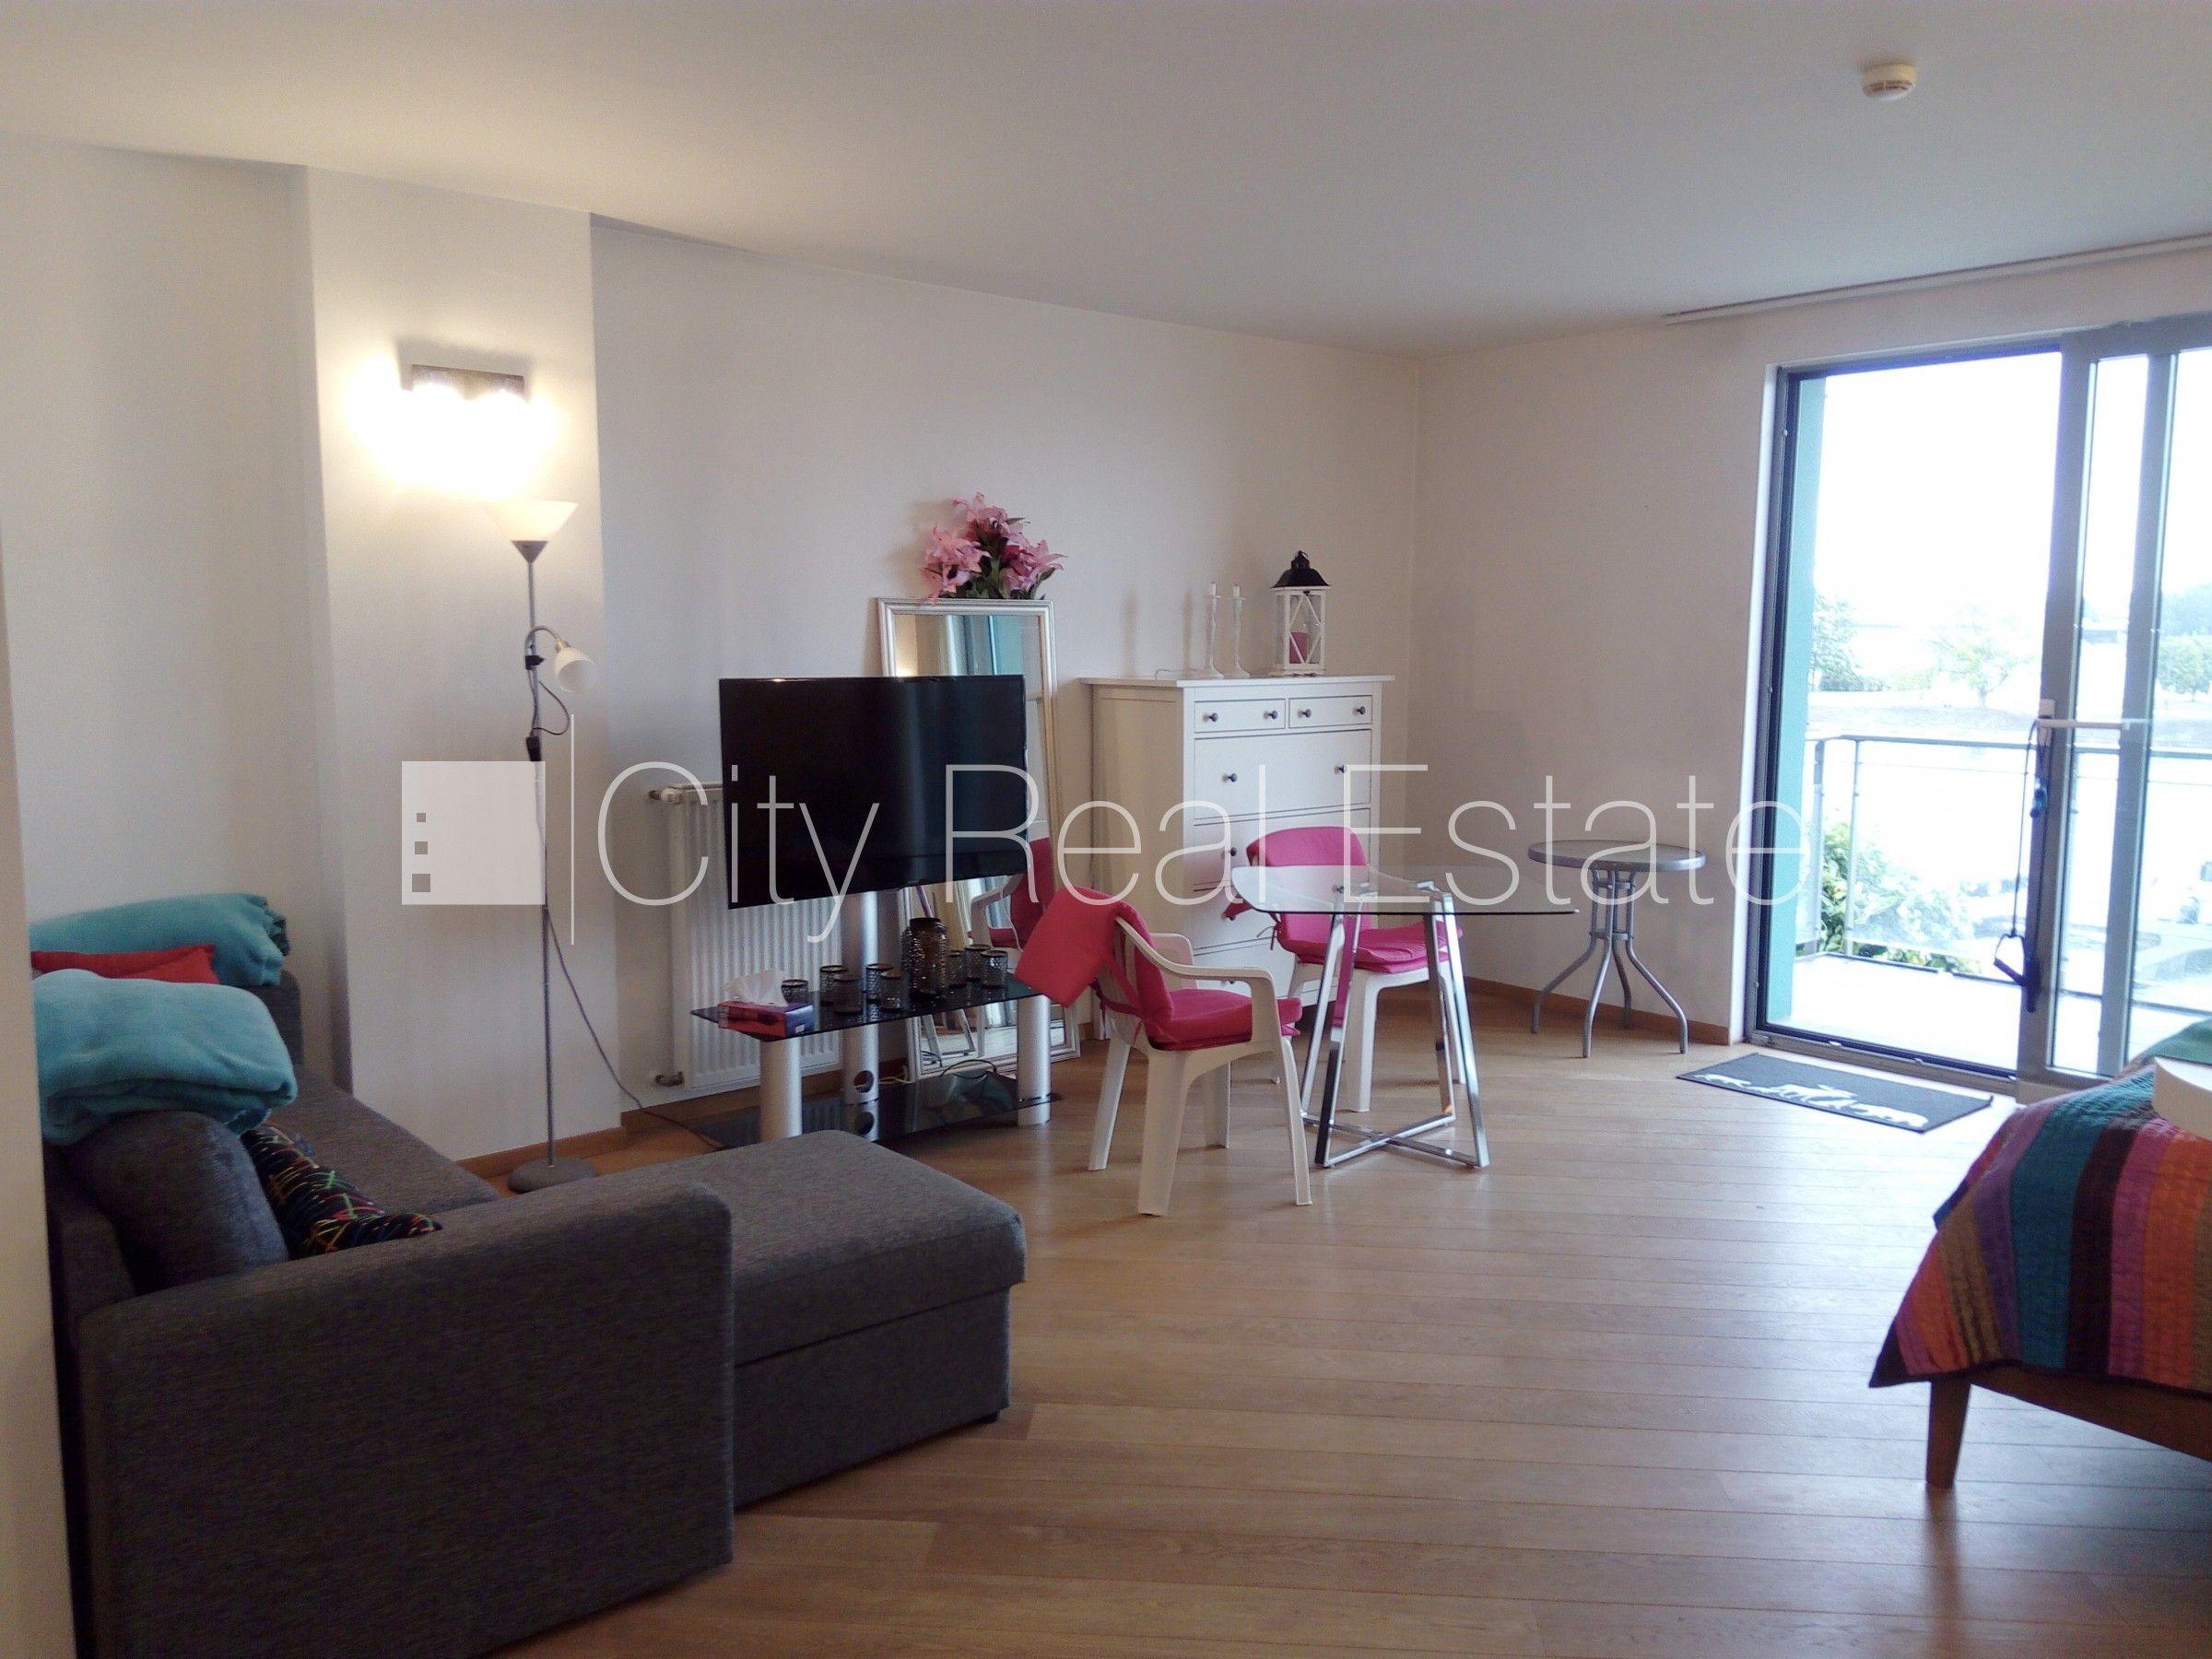 Apartment for sale in Riga, Kliversala, Kugu street, 54 ...